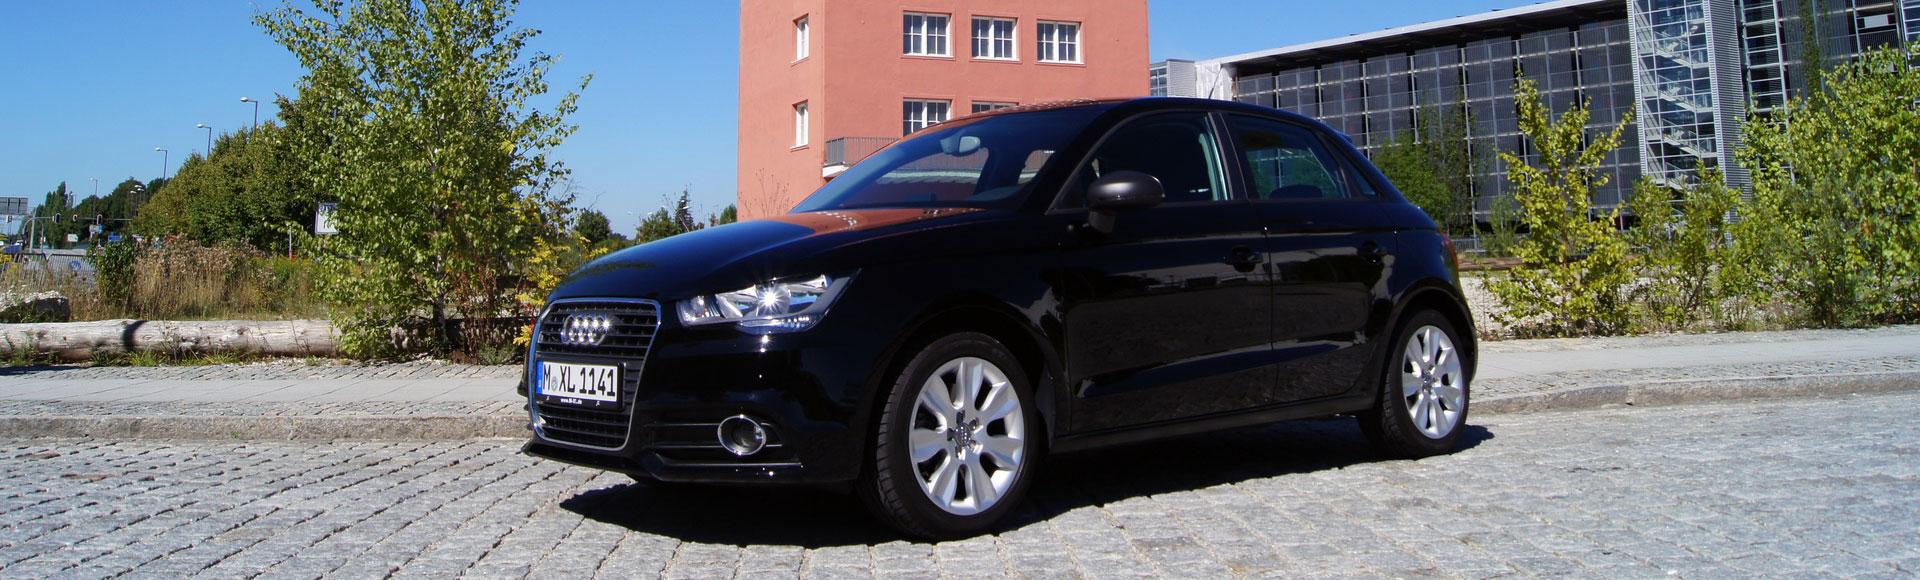 Audi A1 2012 Sommer 150